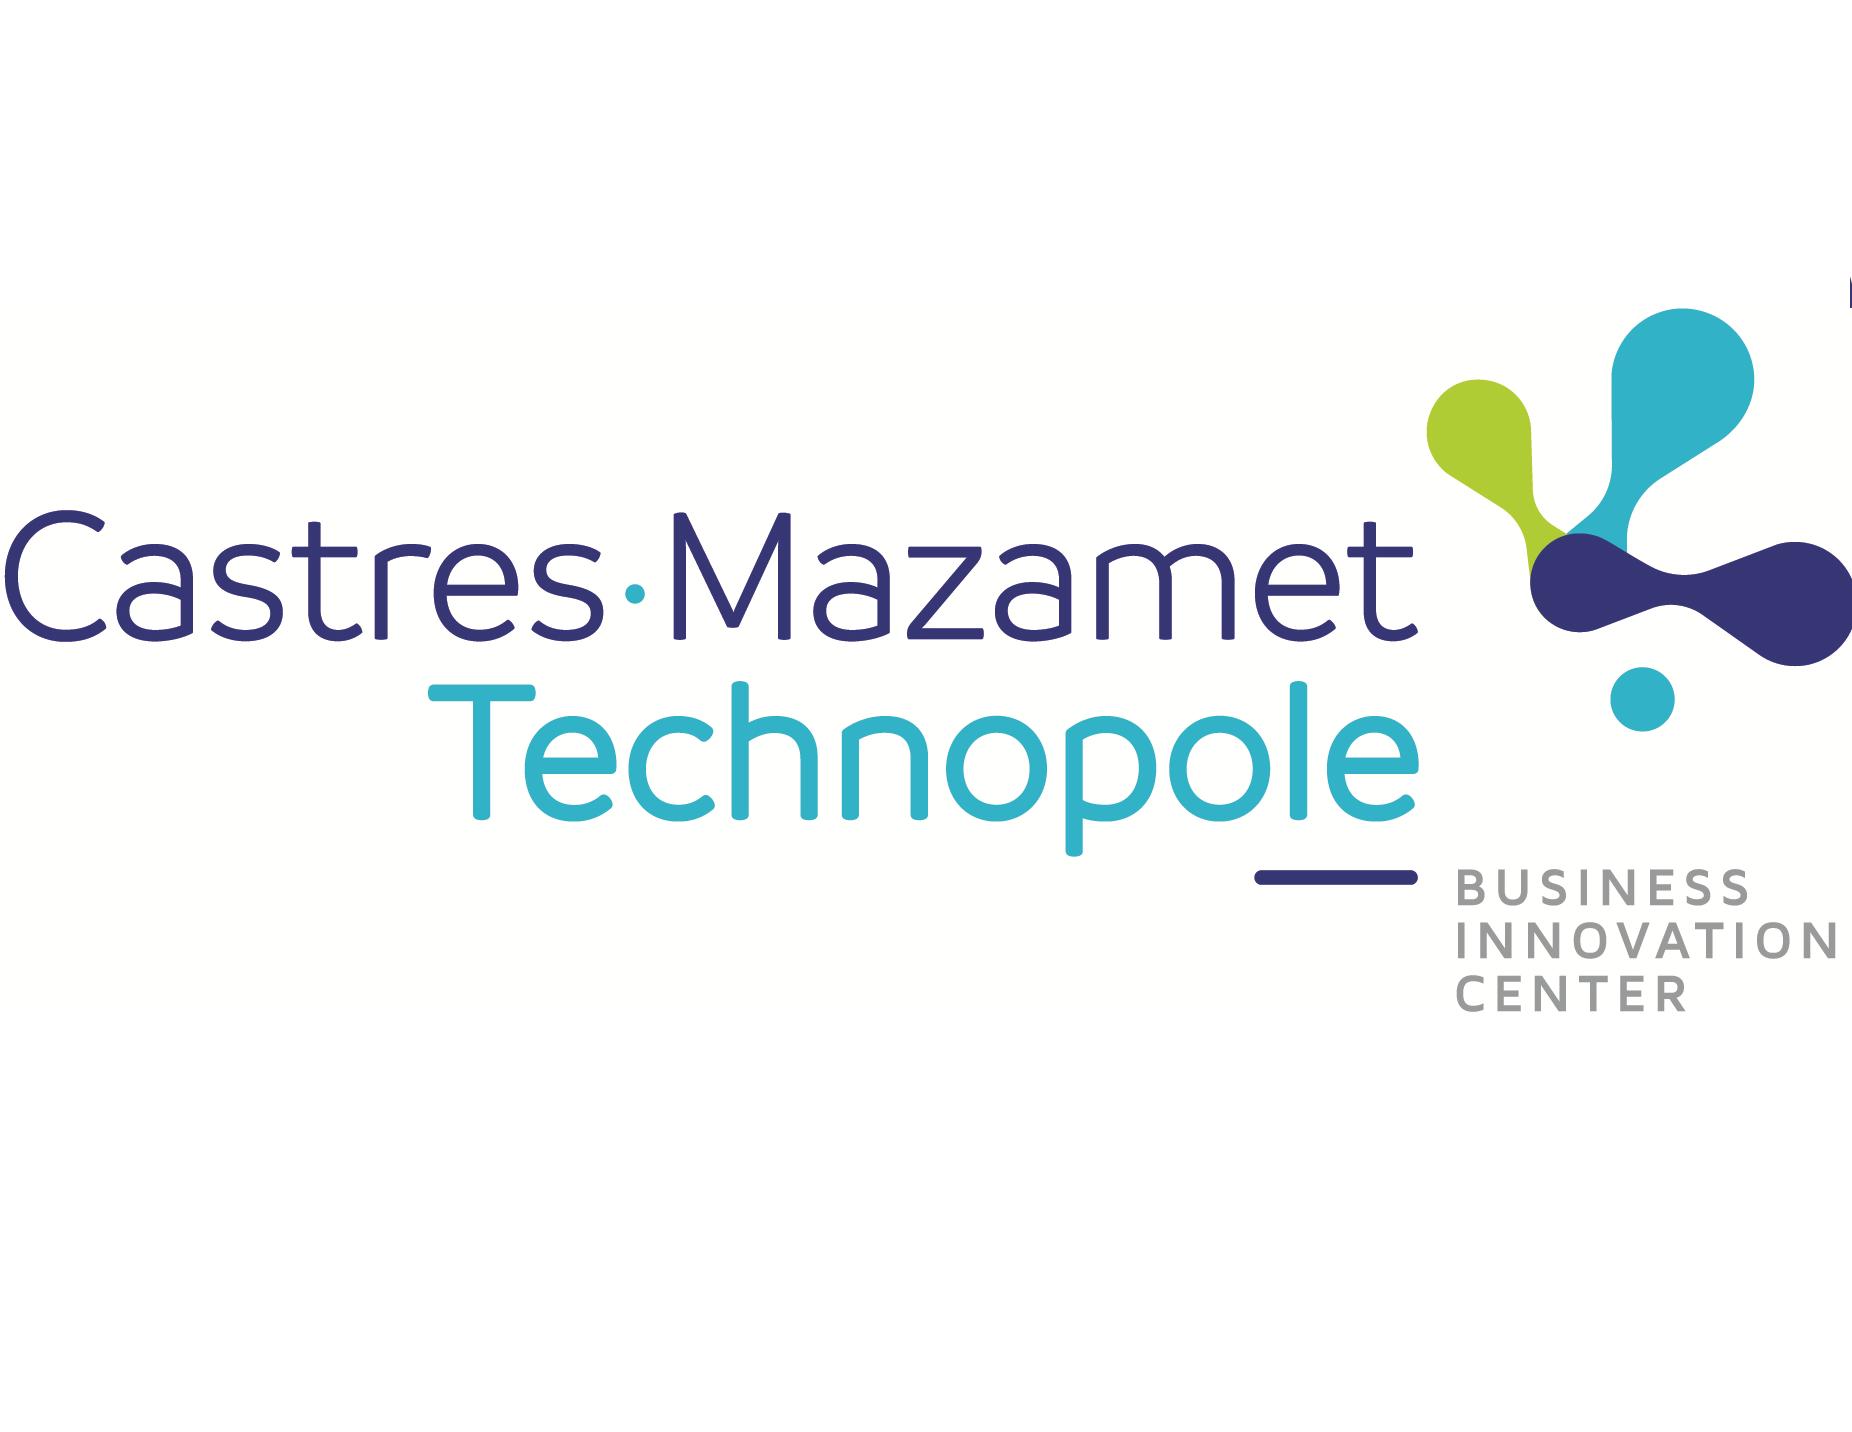 Castres Mazamet Technopole